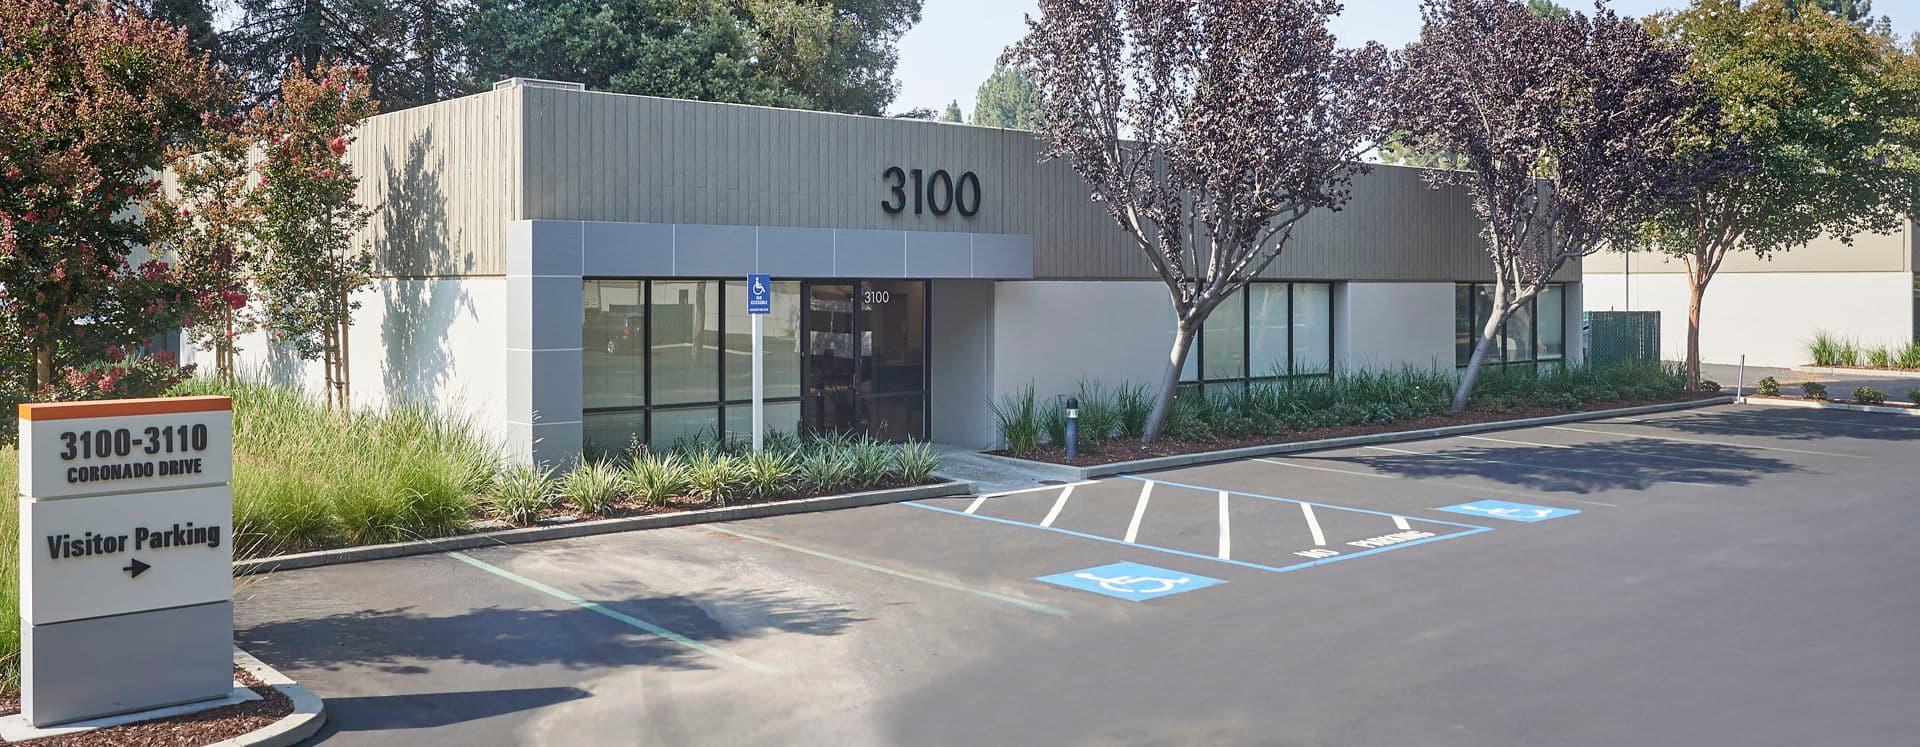 Exterior view of 3100 Coronado Drive at Coronado Park @ The Square..